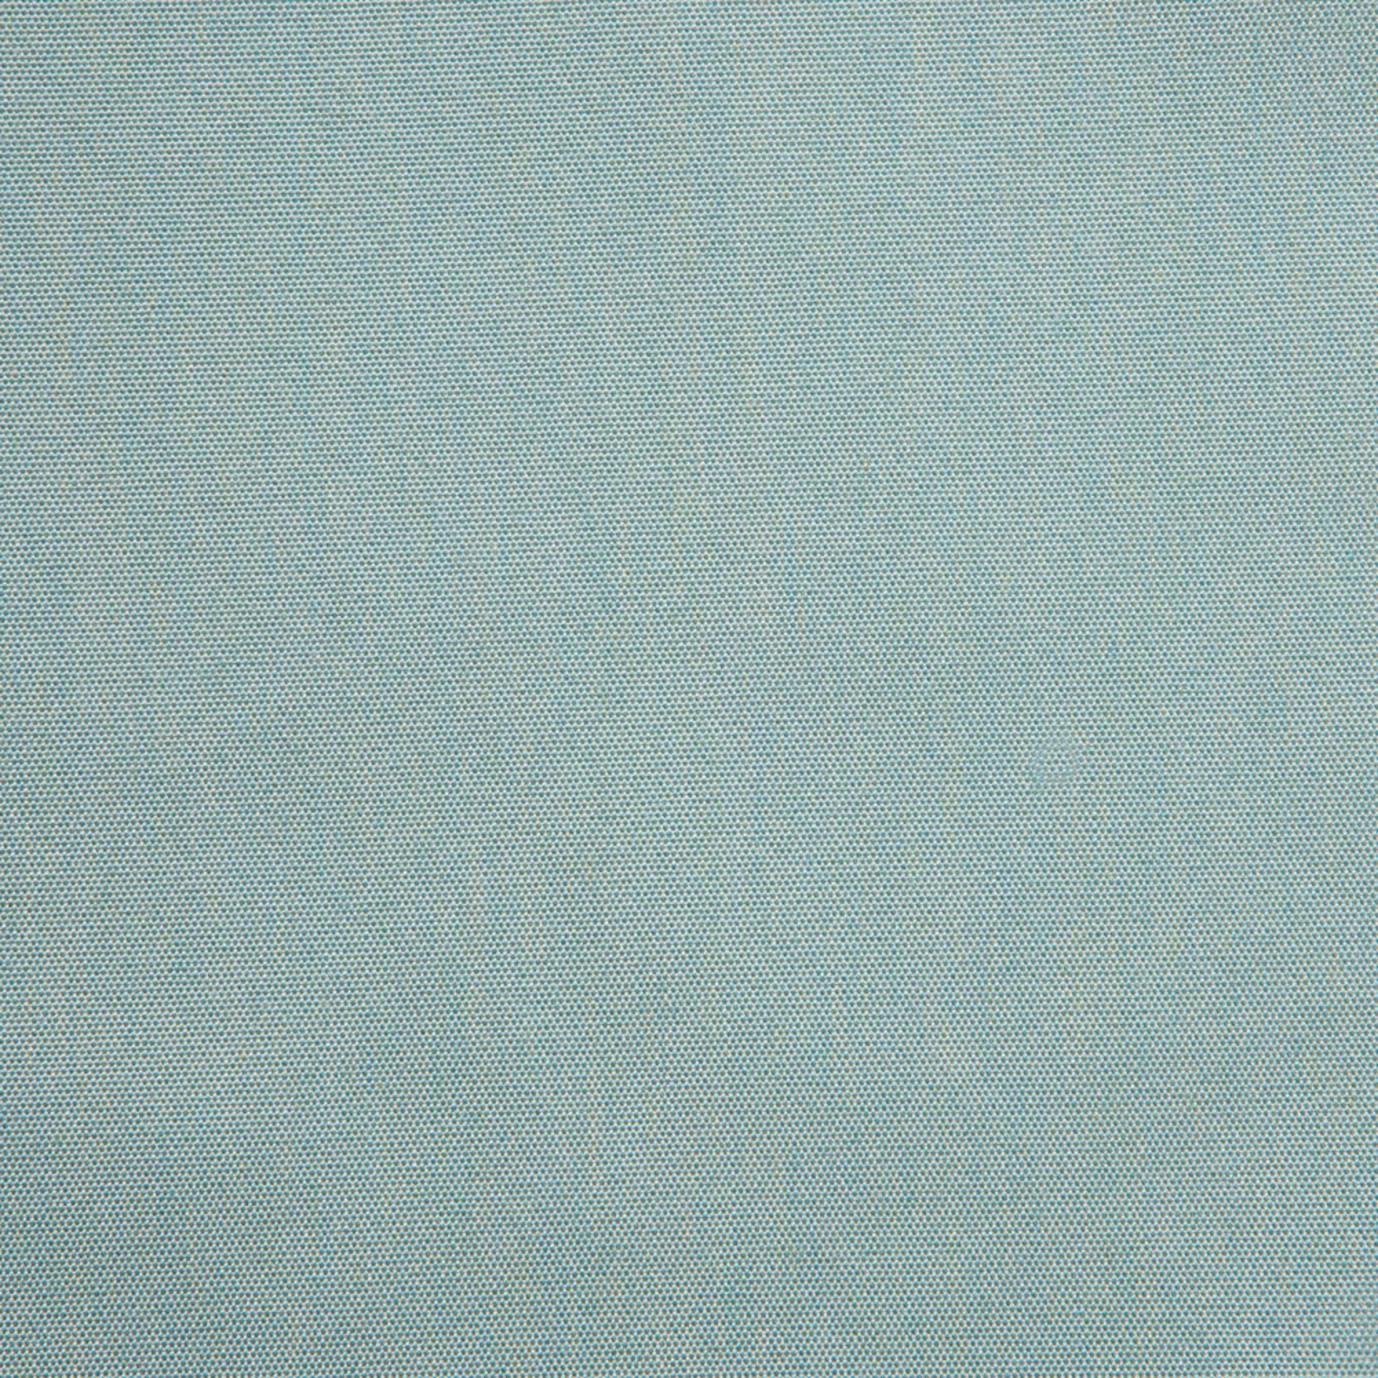 Deco™ Club Ottomans - Bliss Blue